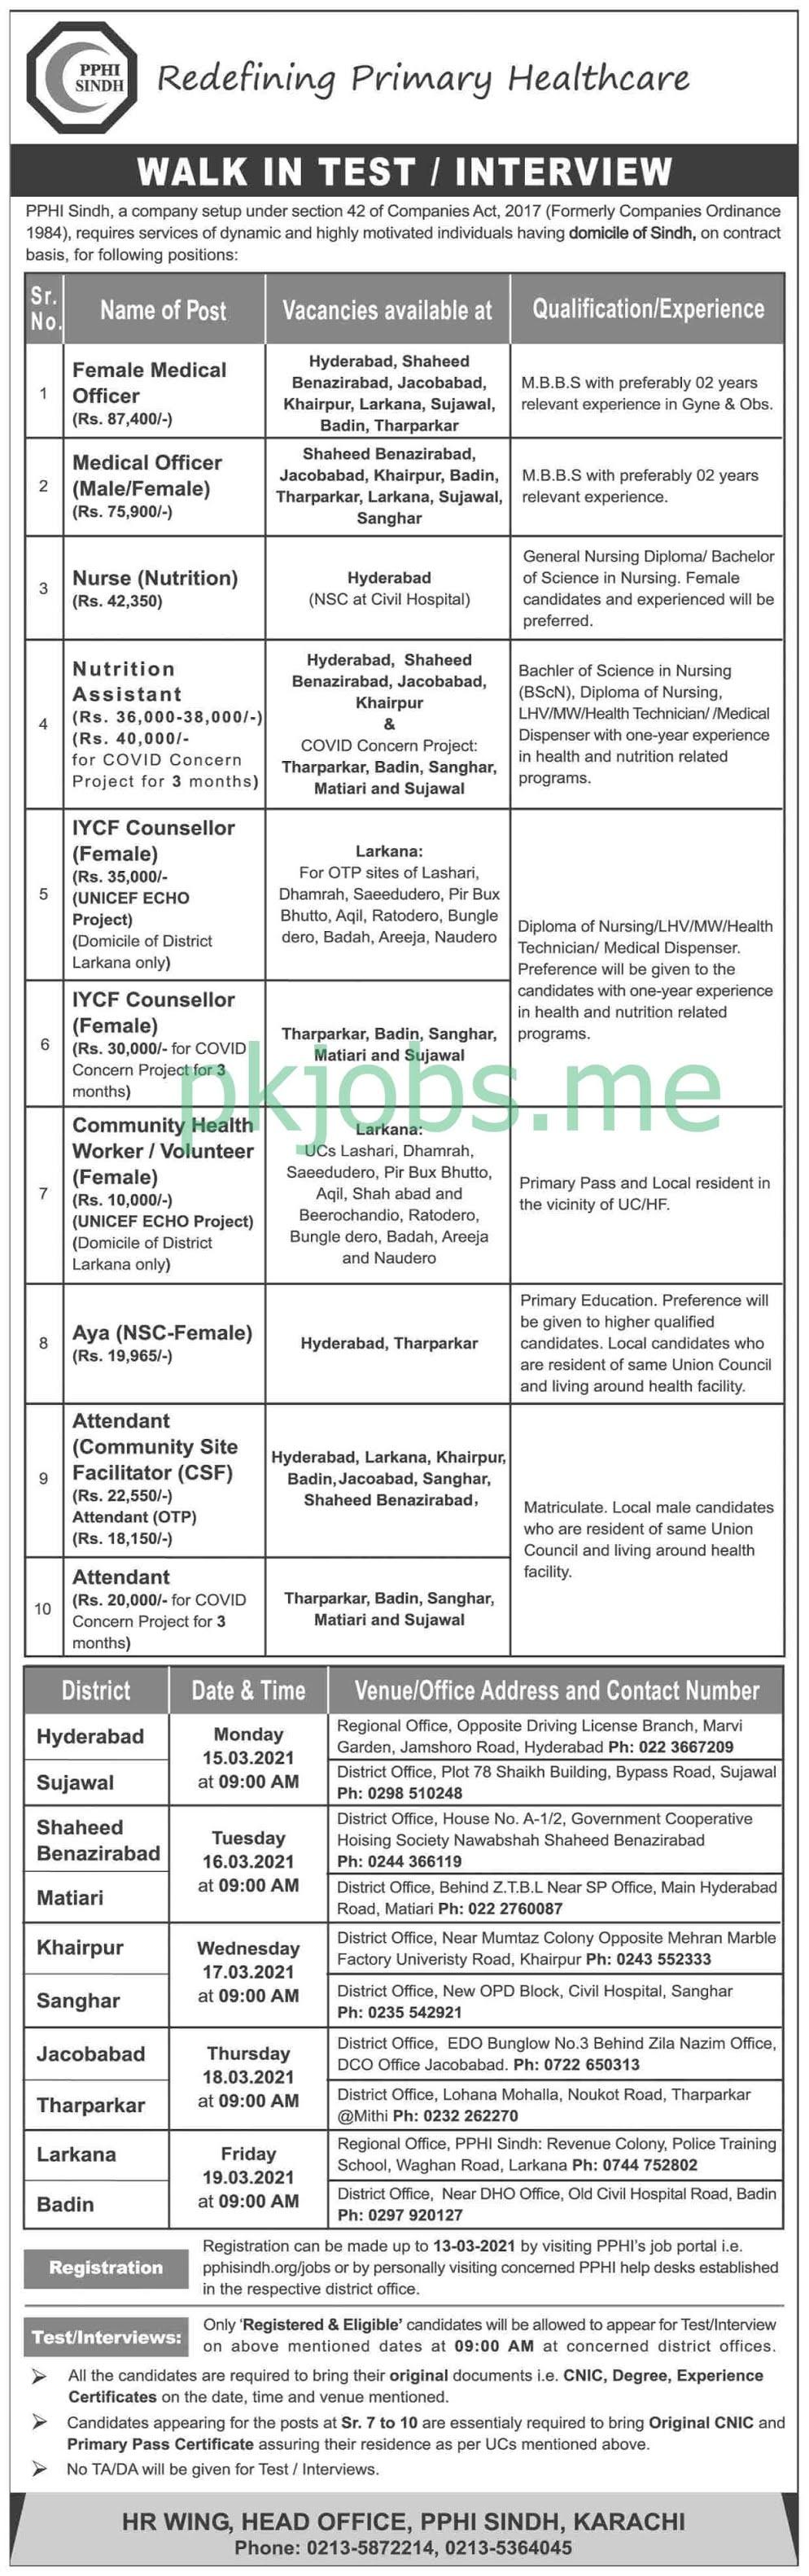 Latest PPHI Sindh Medical Posts 2021